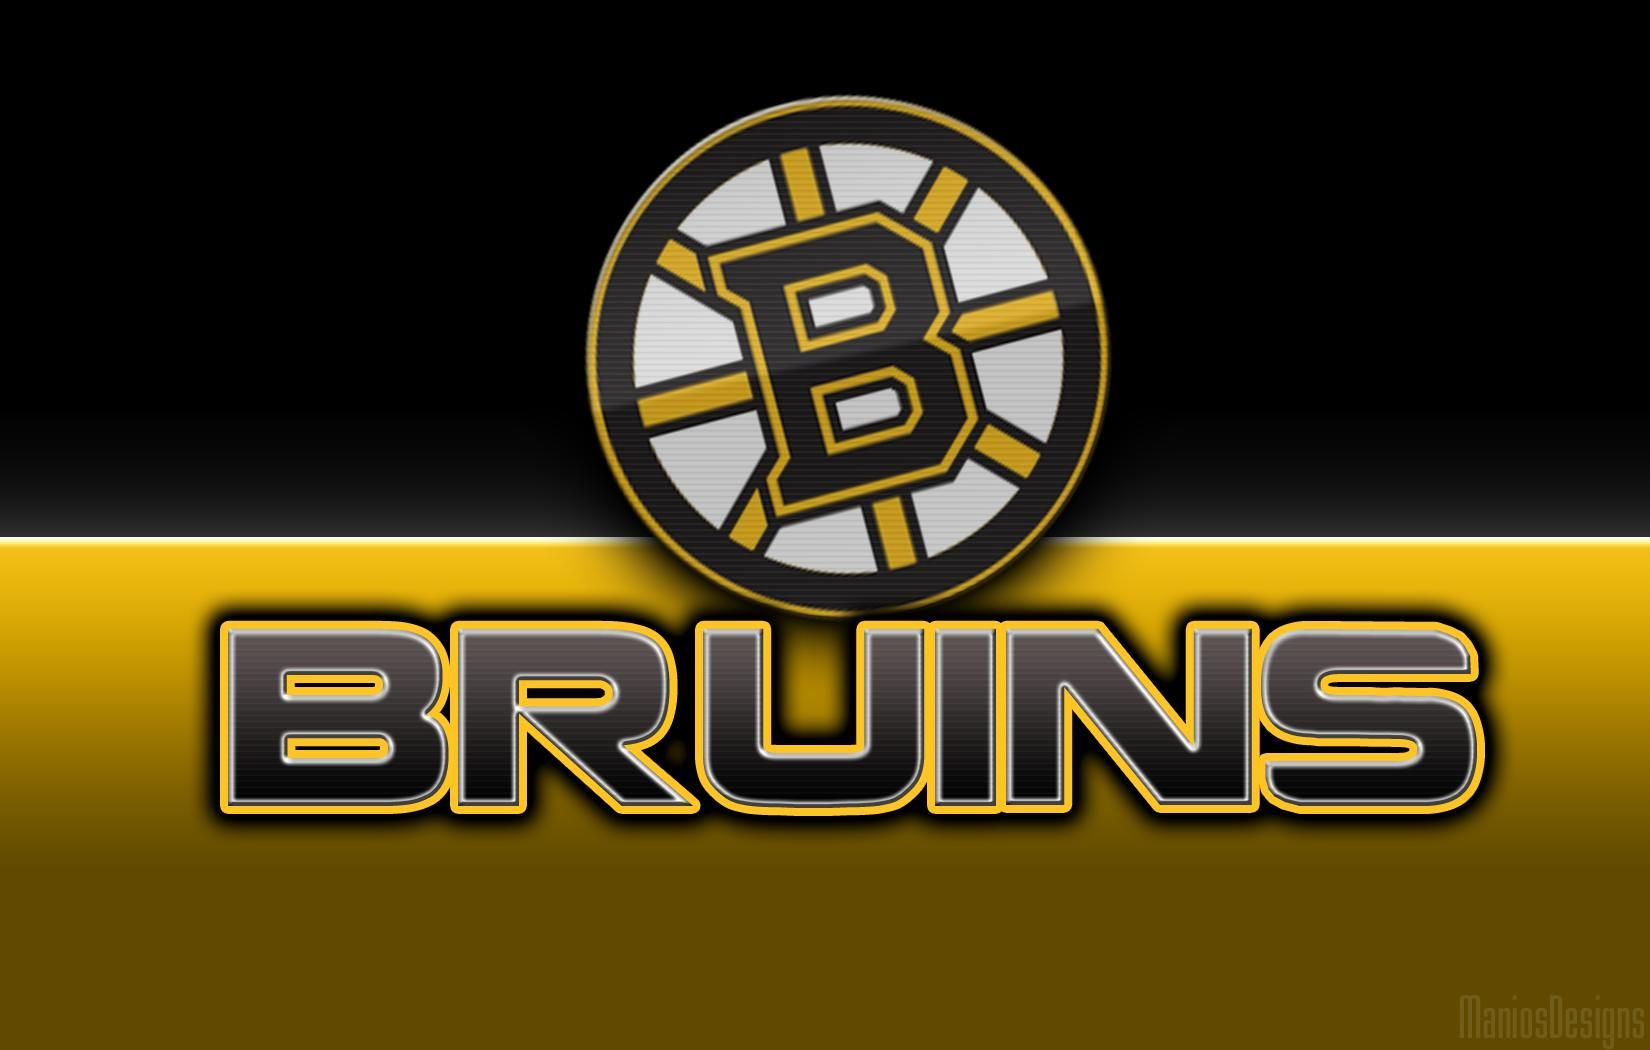 Iphone Sports Boston Bruins Wallpaper Id 1650 1050 Boston Bruins Backgrounds 34 Wallpapers Adorable Wallpap Boston Bruins Boston Bruins Wallpaper Bruins